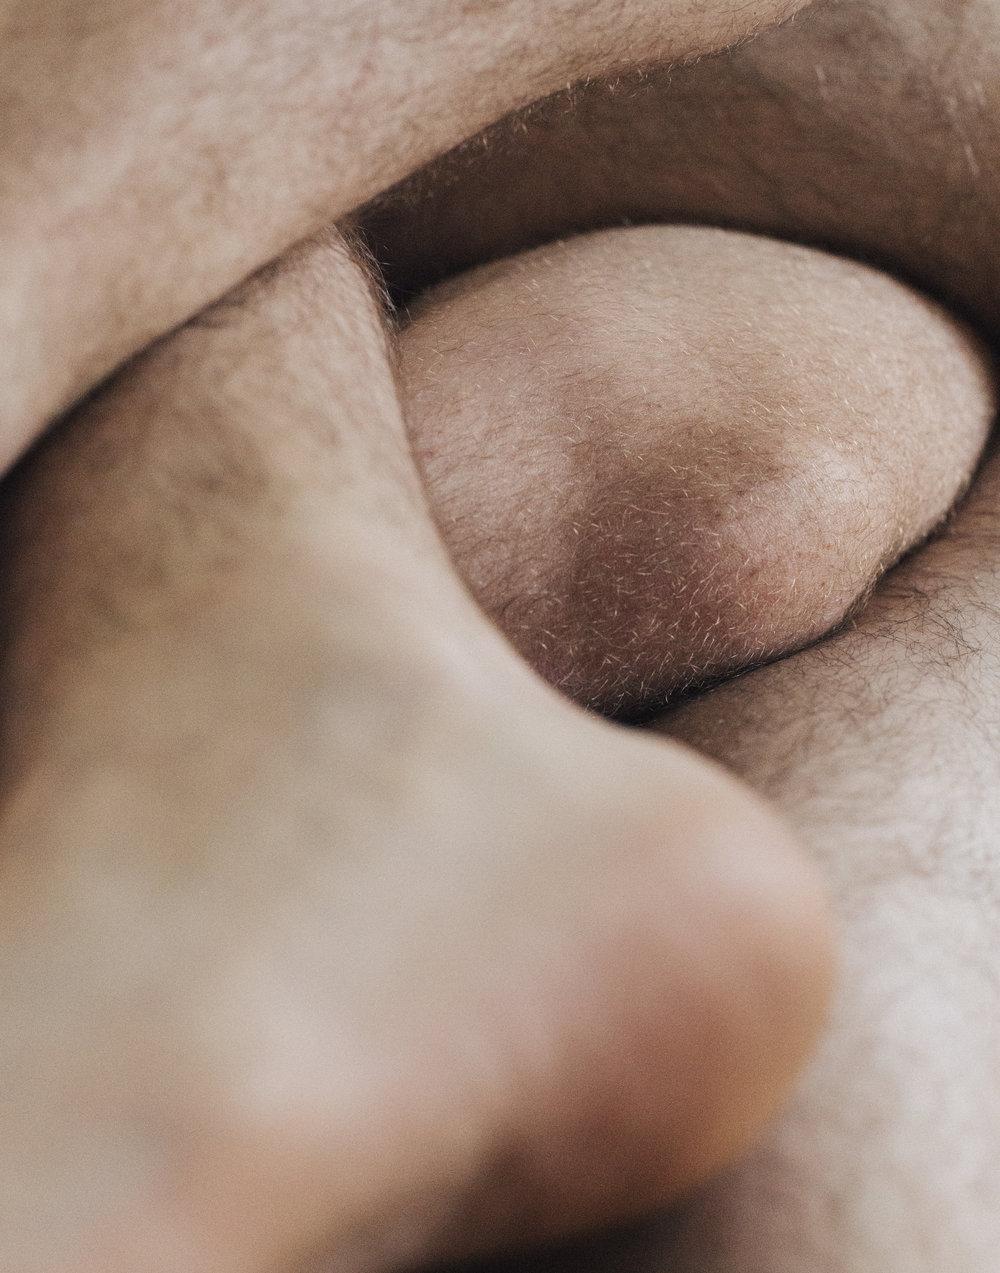 legswtf.jpg